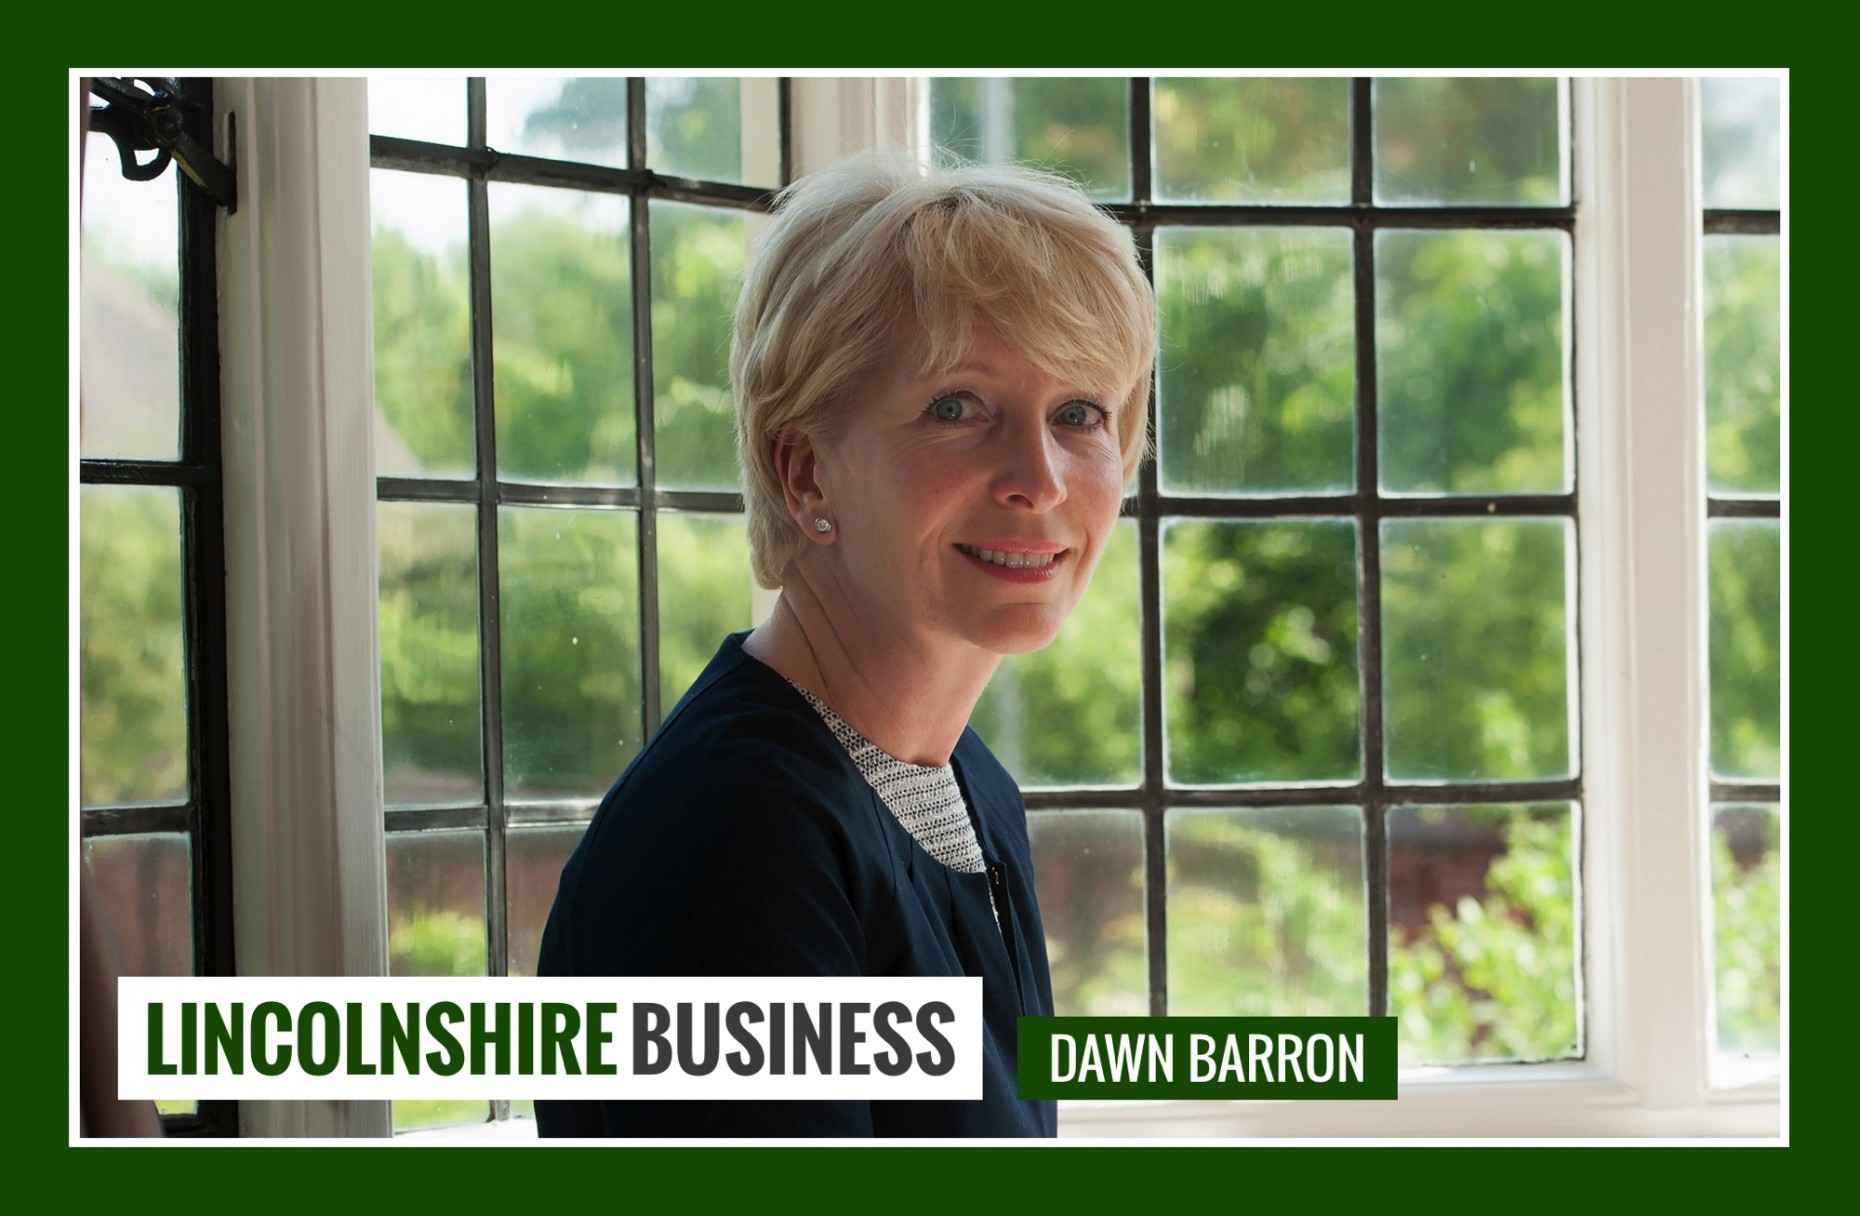 Lincolnshire Business 32 Dawn Barron